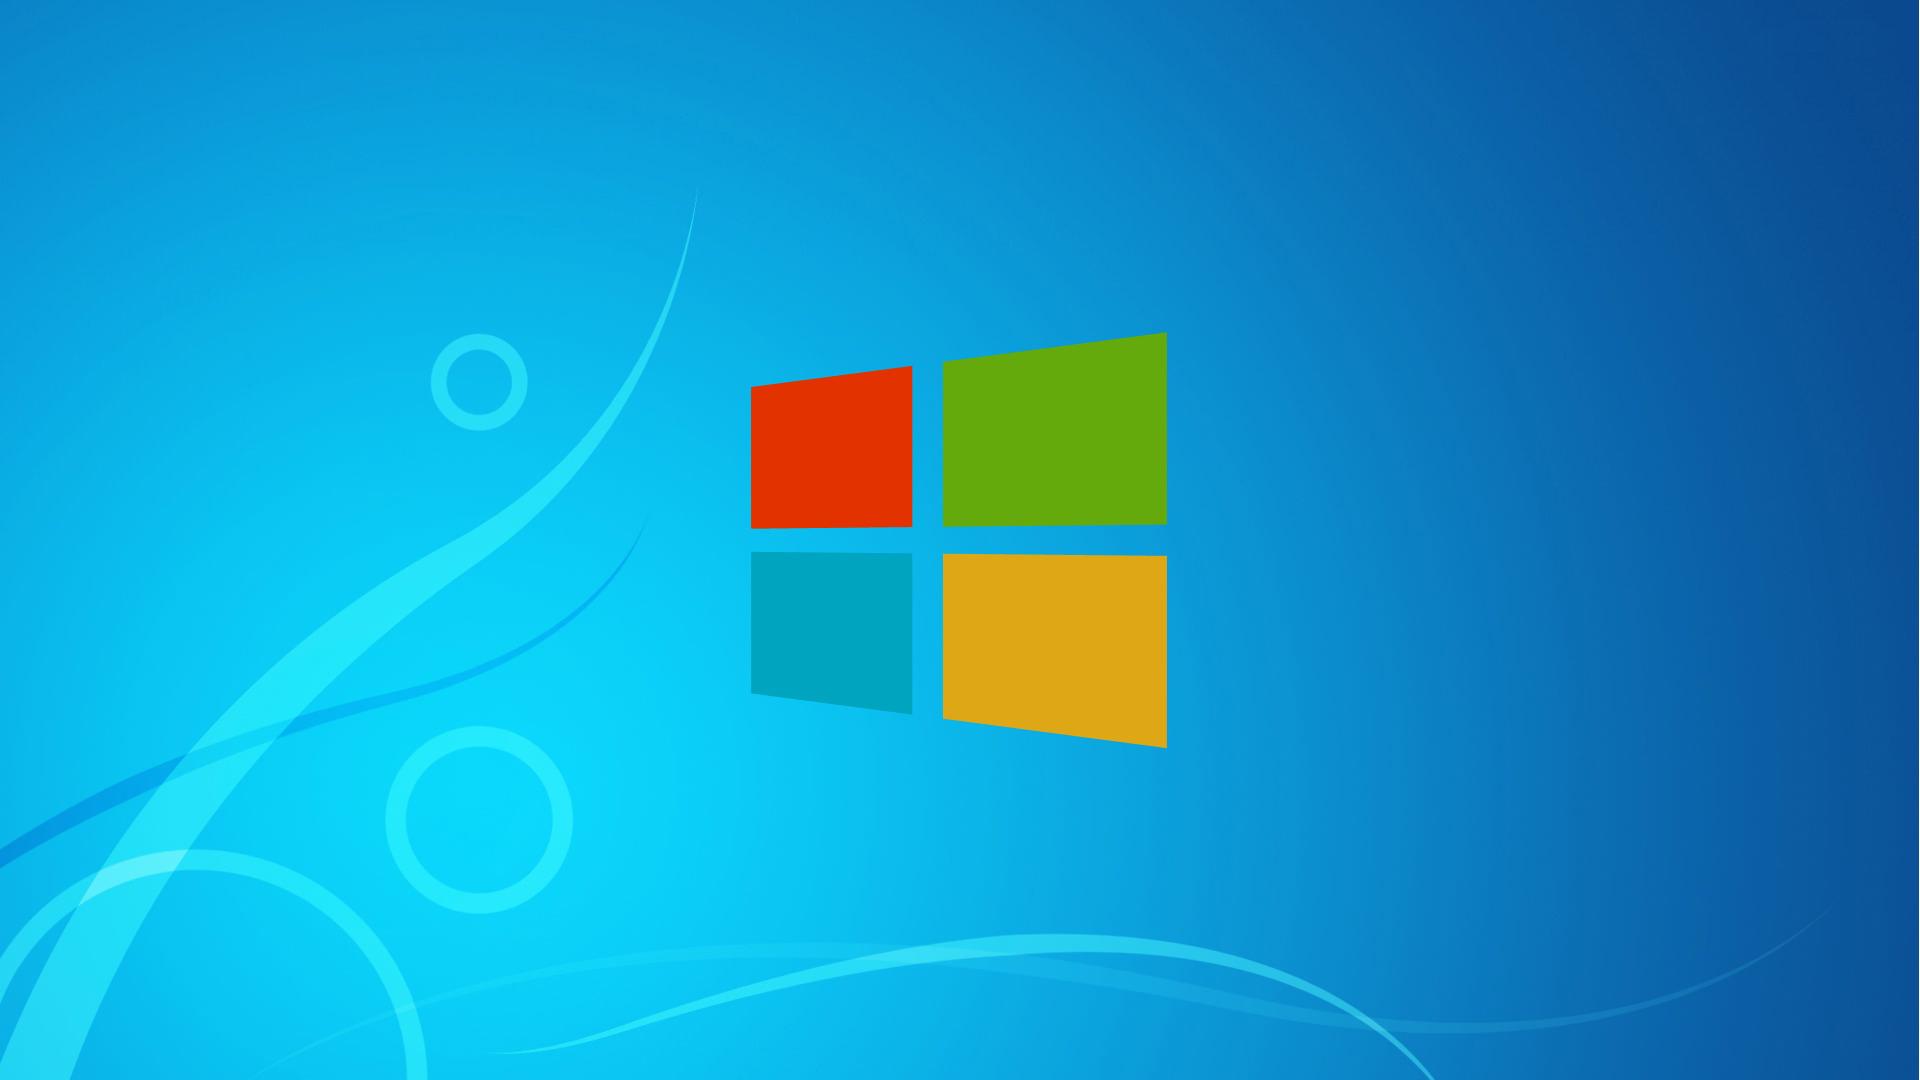 windows-8-desktop-background-hd